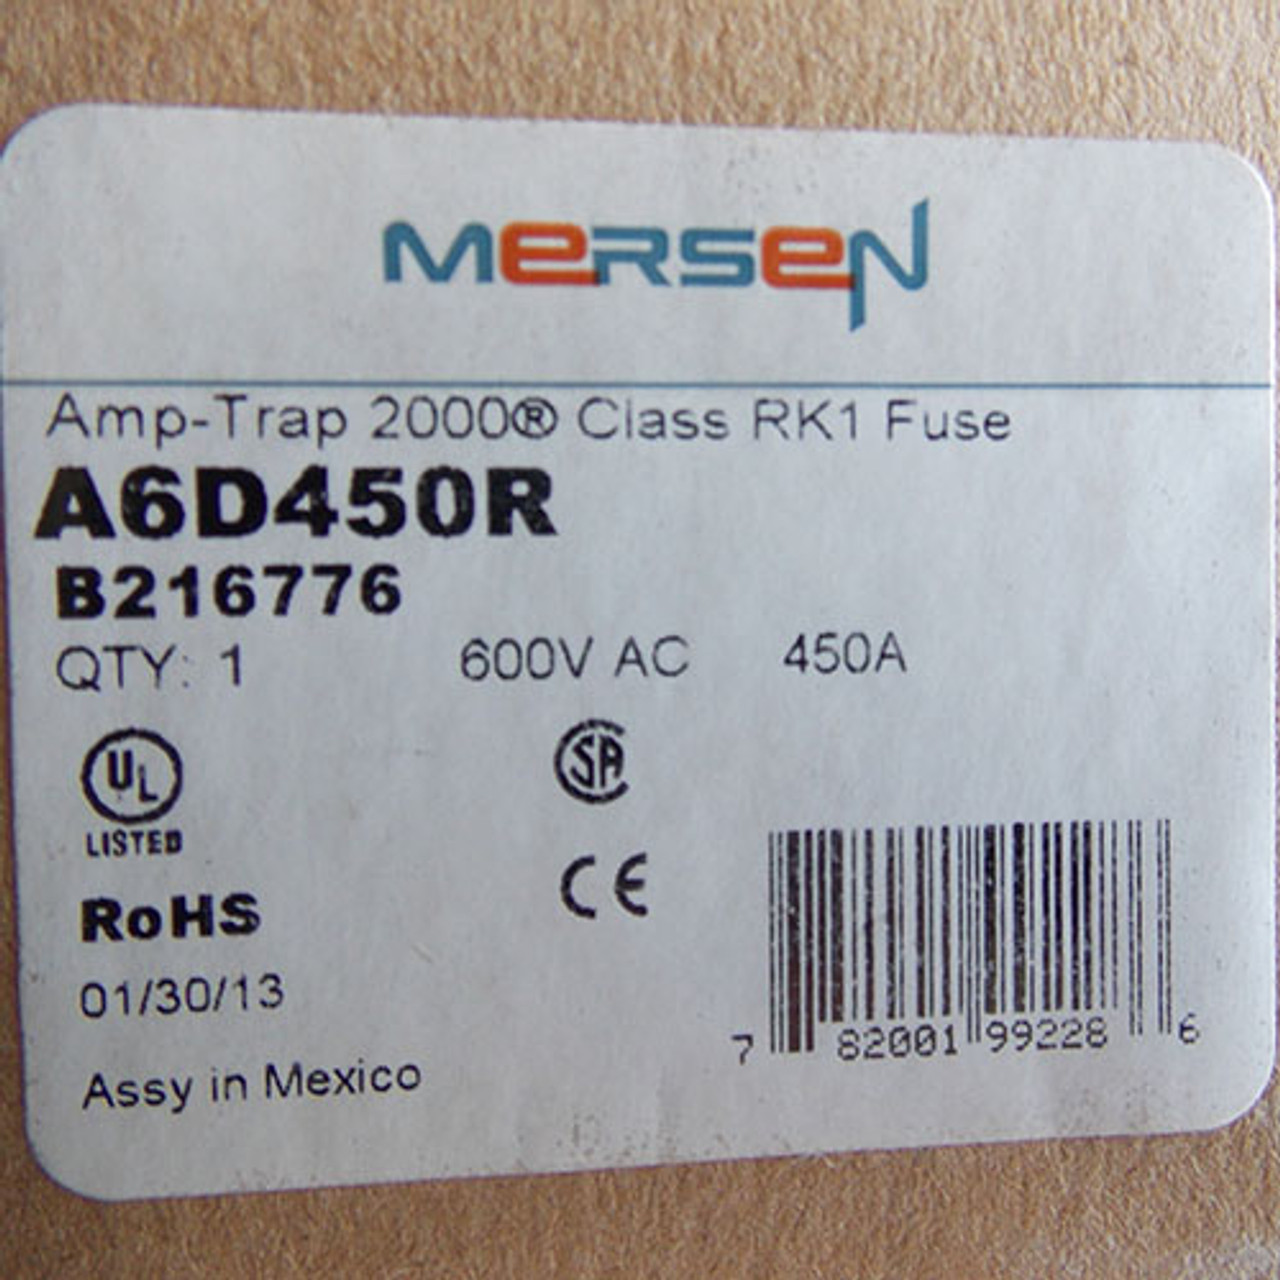 Mersen Ferraz Shawmut Amp-Trap 2000 A6D450R 450A 600V RK1 Time-Delay  Fuse - New